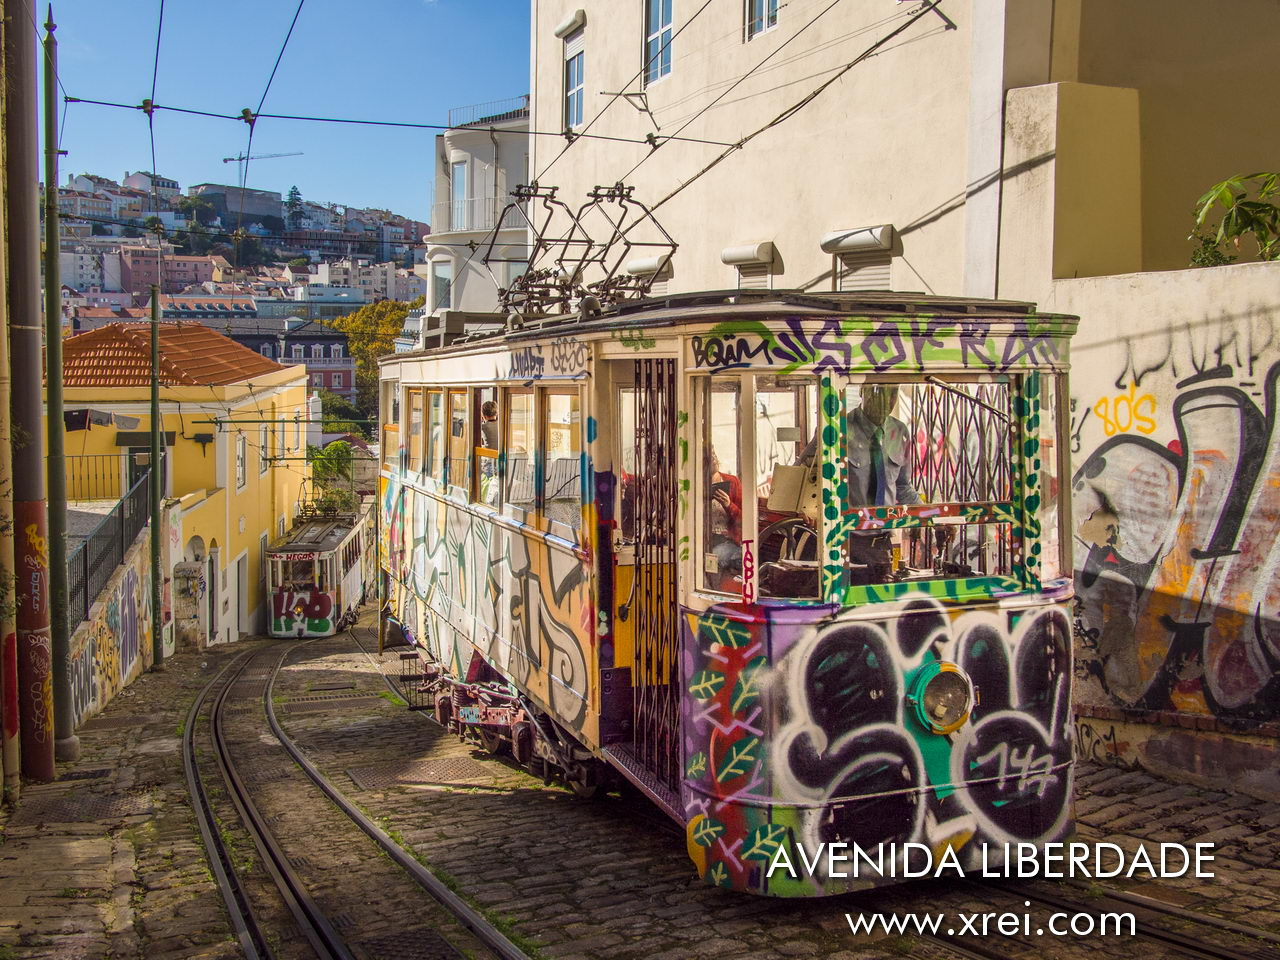 Ascensor do Lavra is the oldest elevator in Lisbon, with connection between Largo da Anunciada and Rua Câmara Pestana, opened in 1884